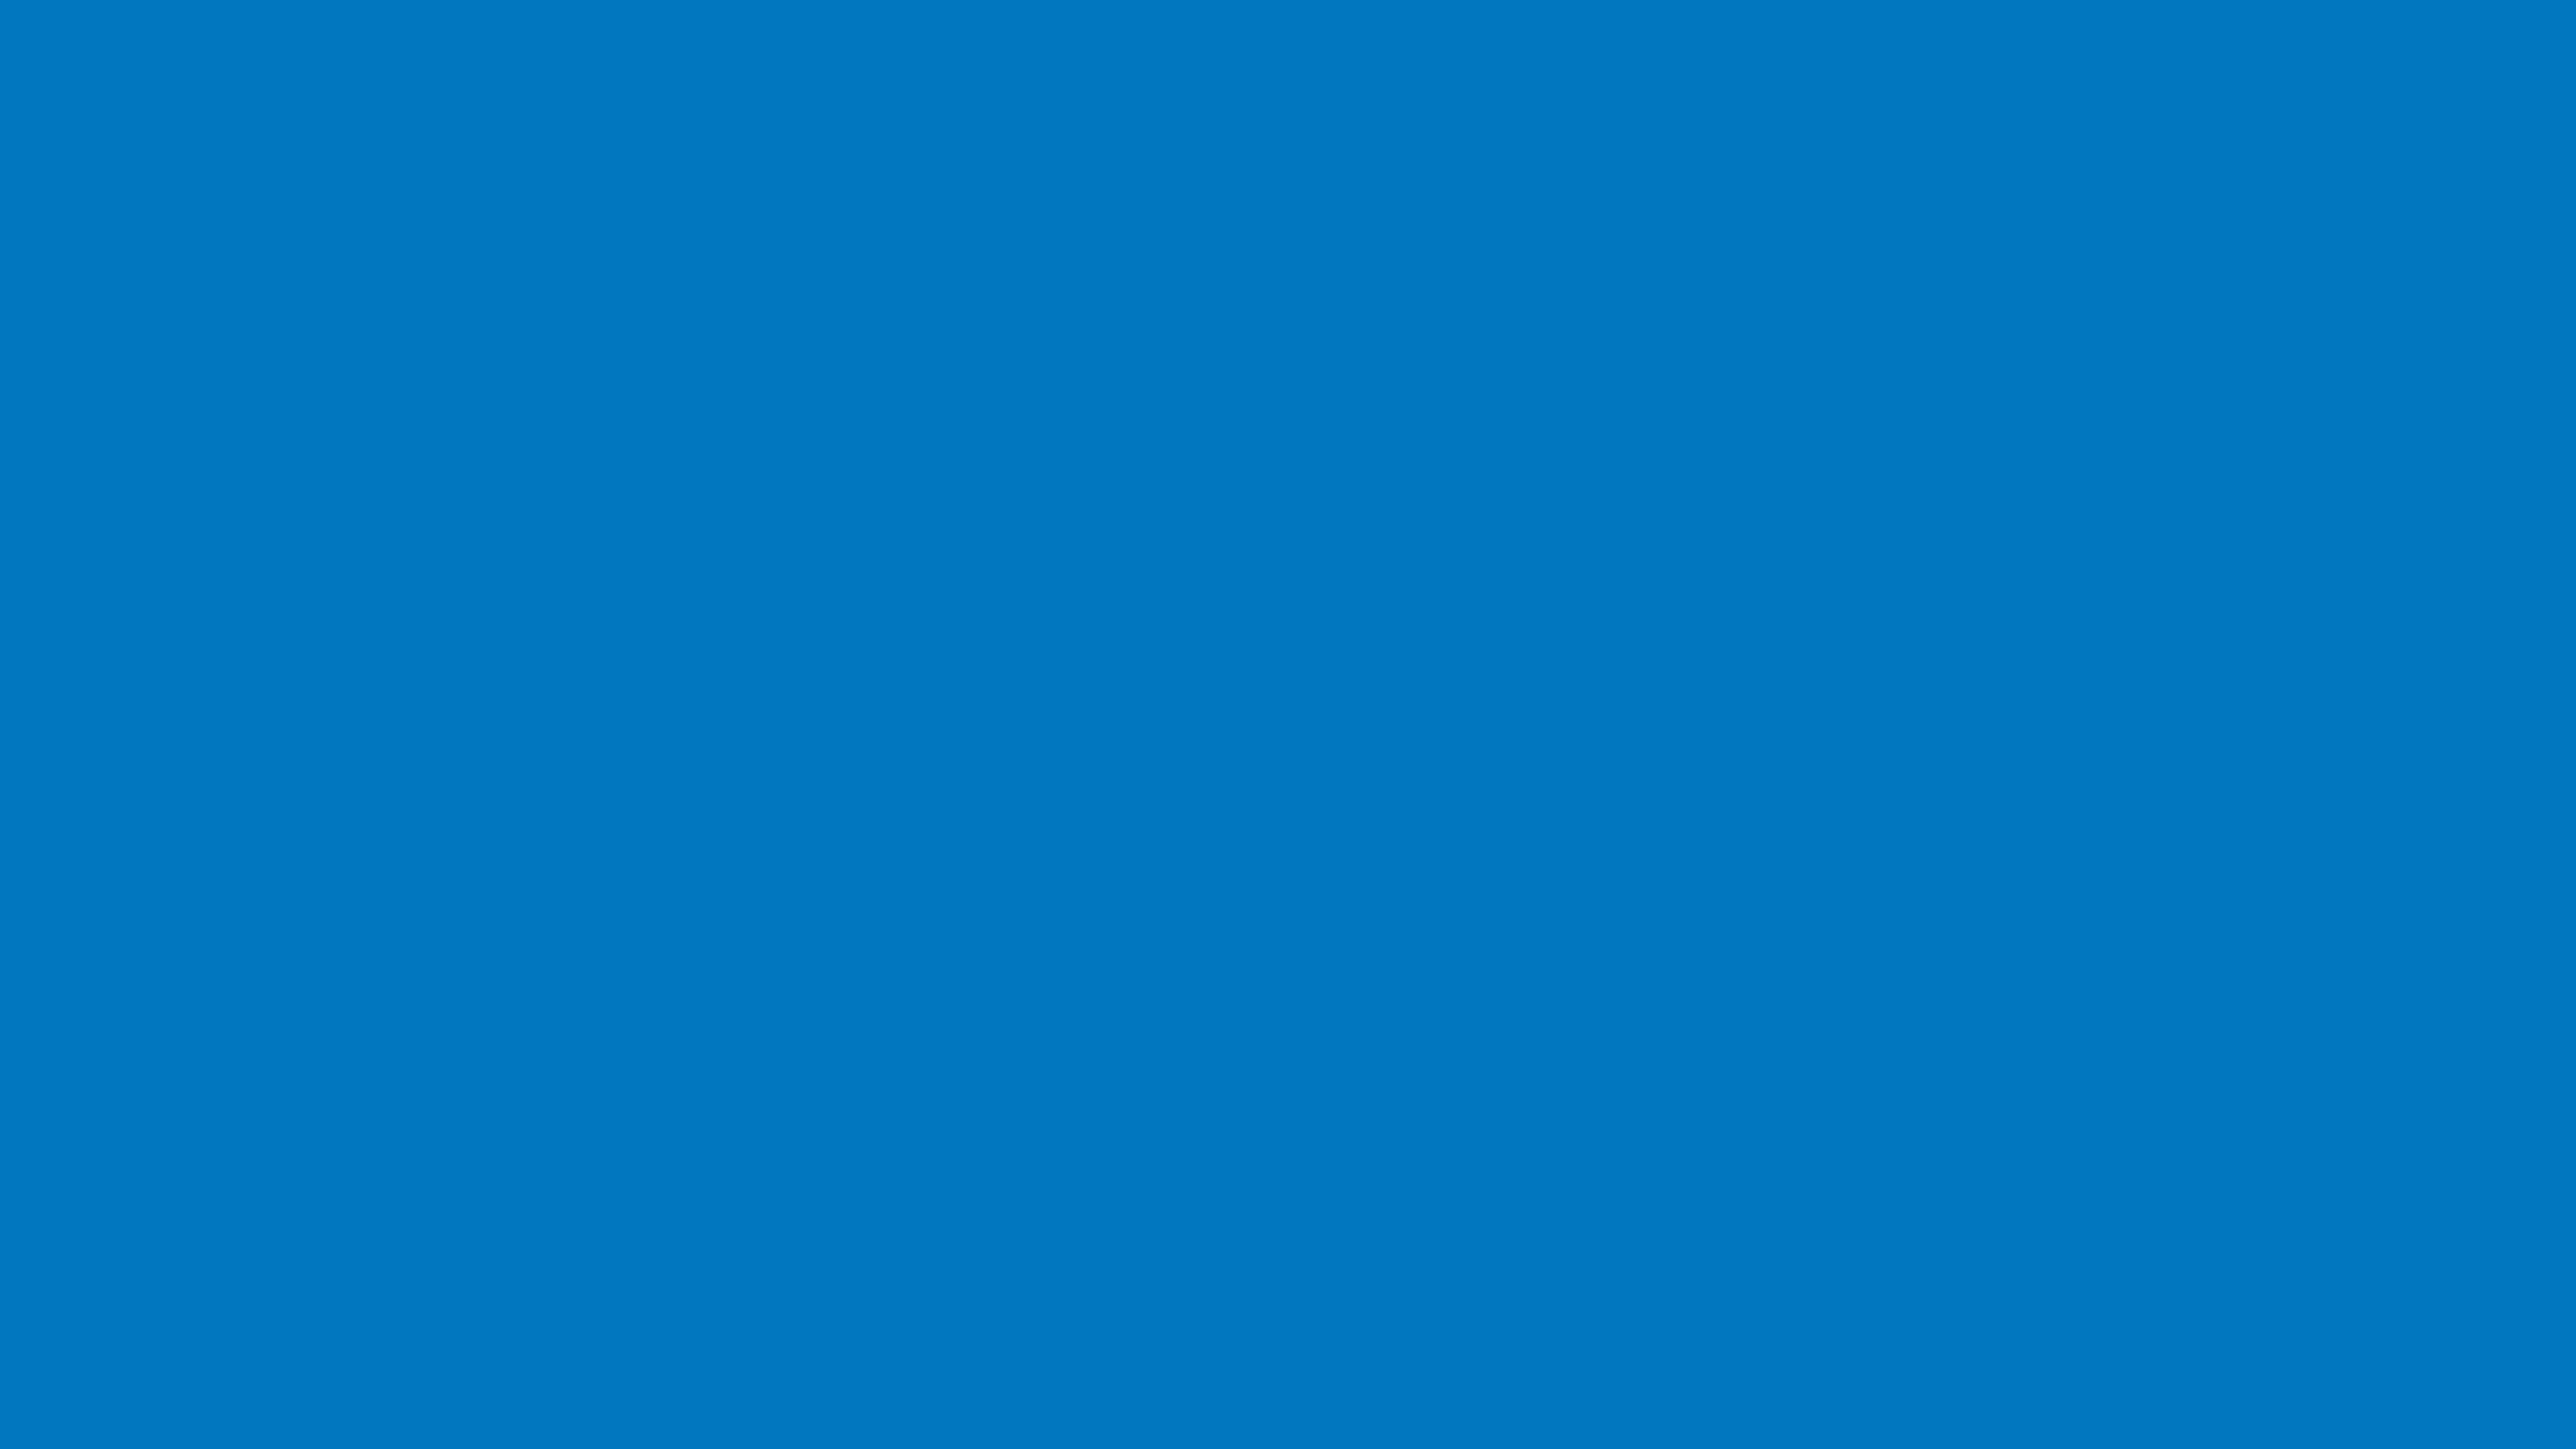 3840x2160 Ocean Boat Blue Solid Color Background